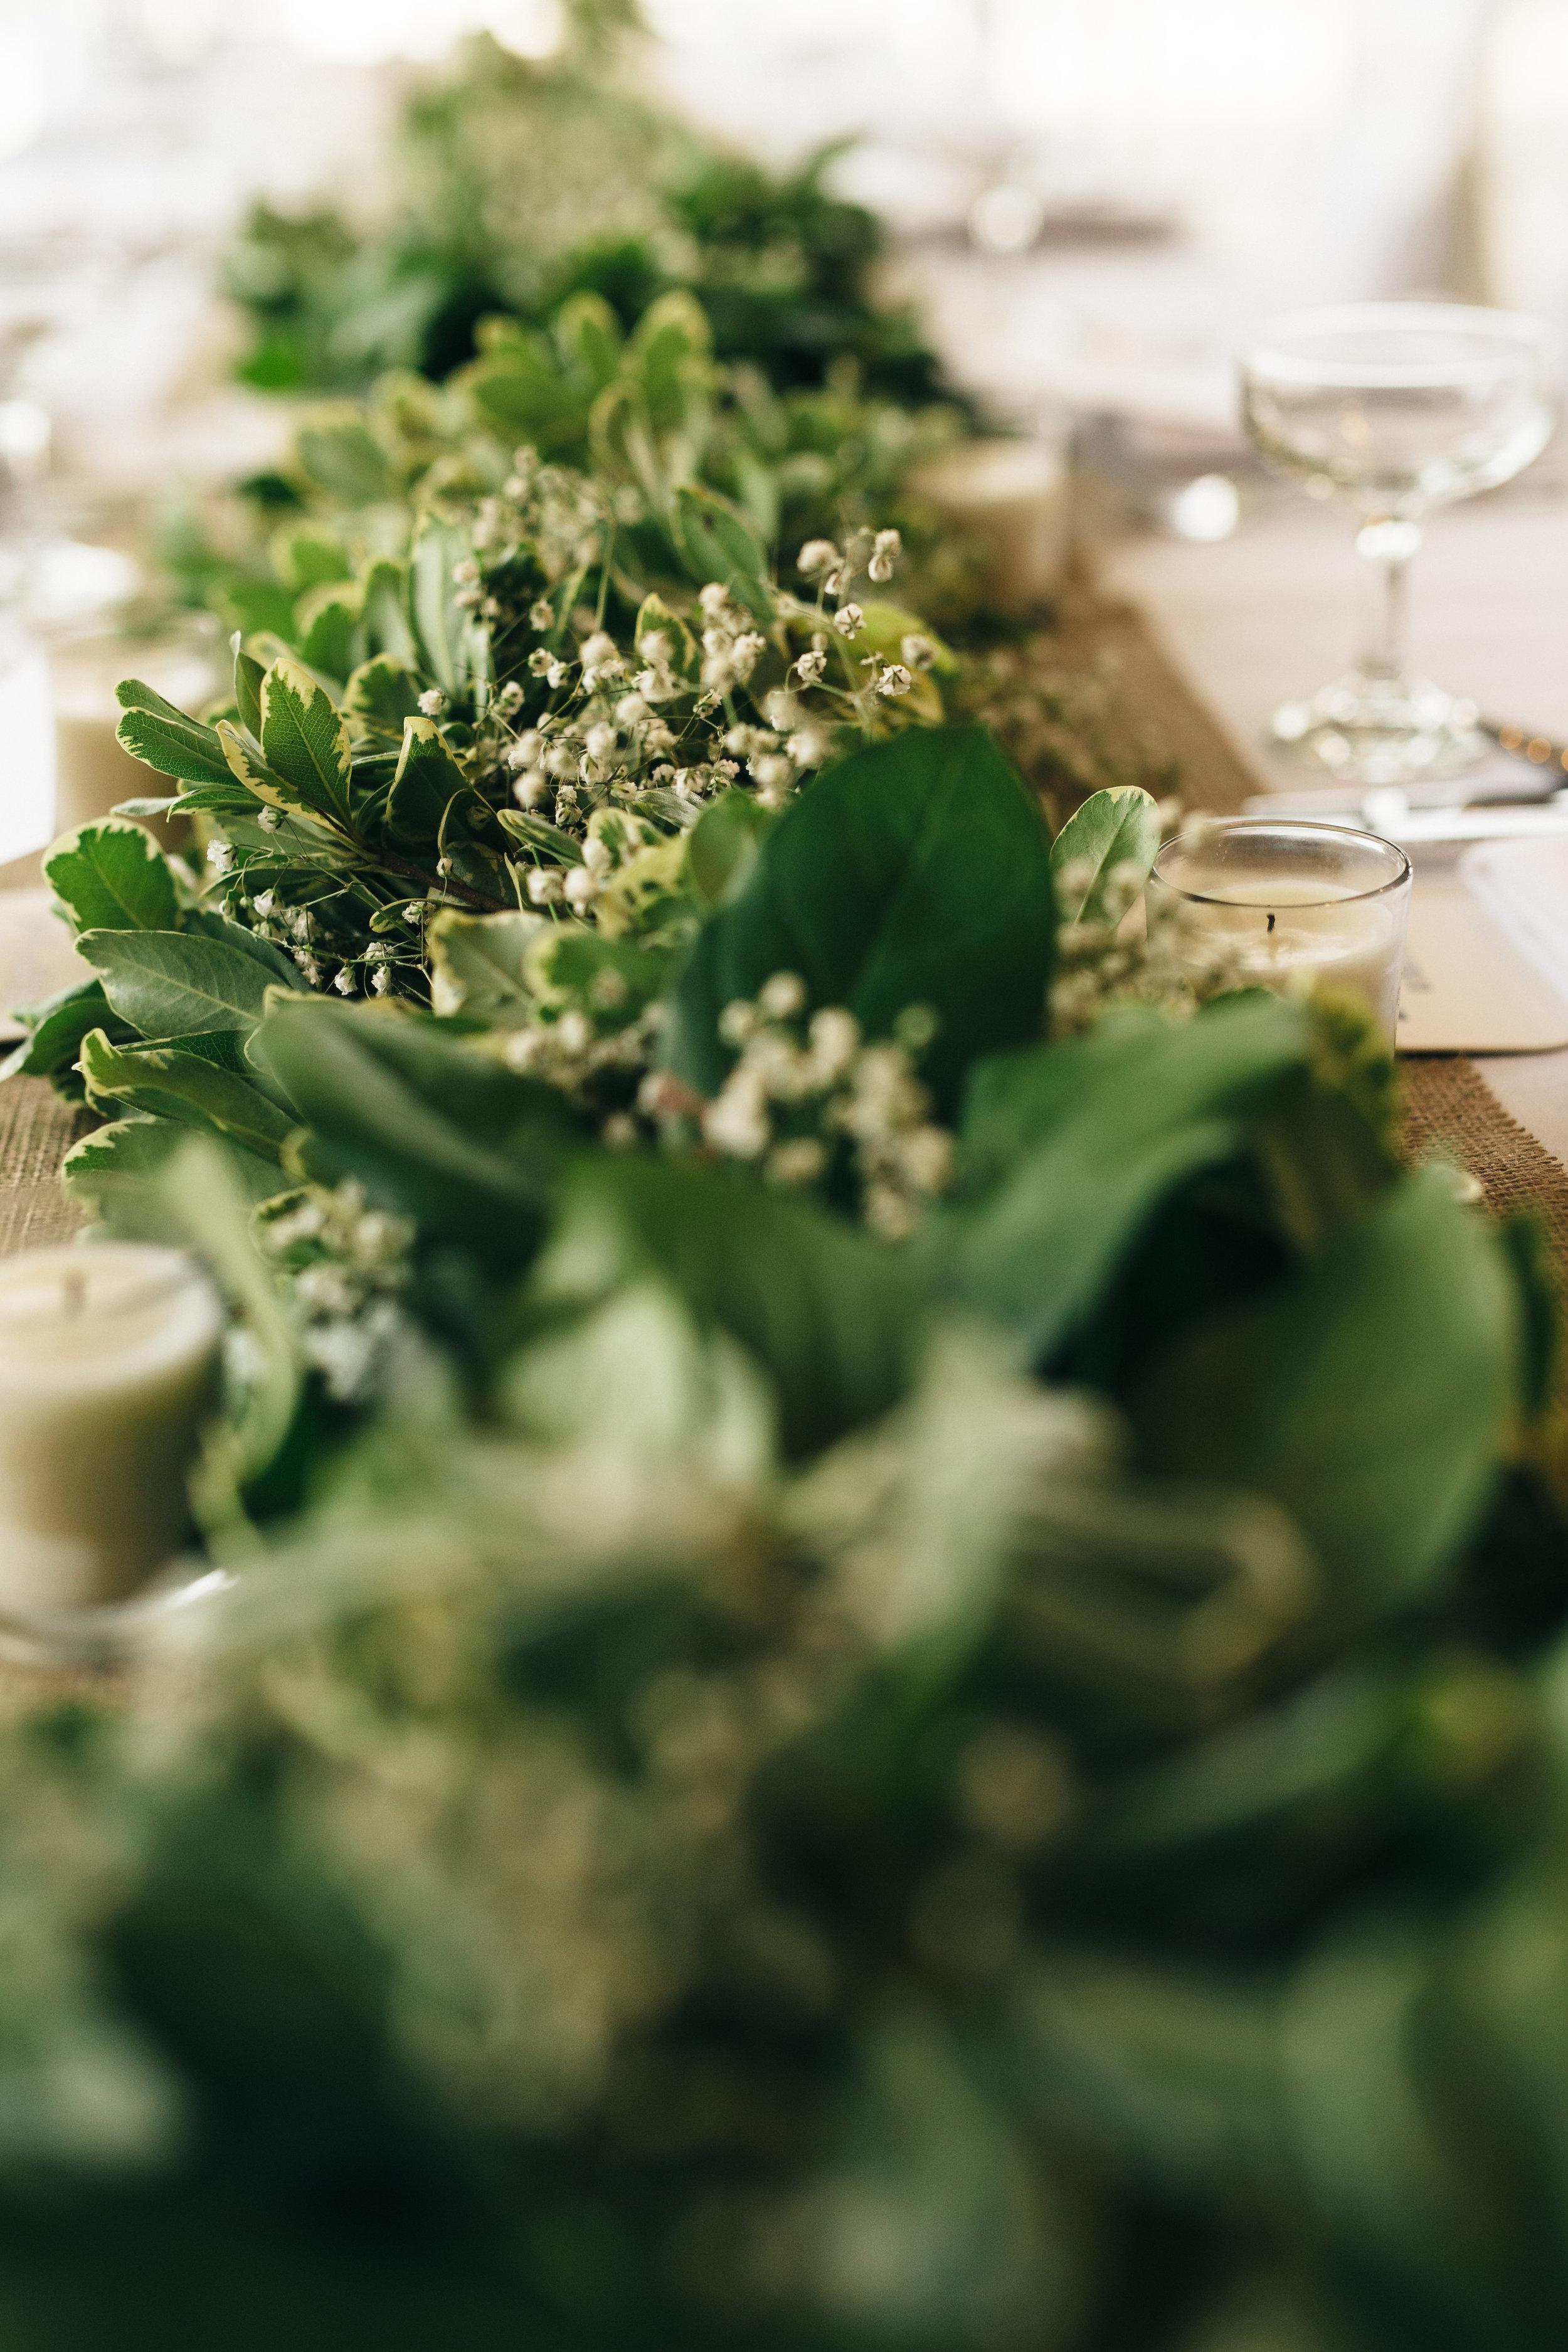 Floral arrangement full of wedding greenery.